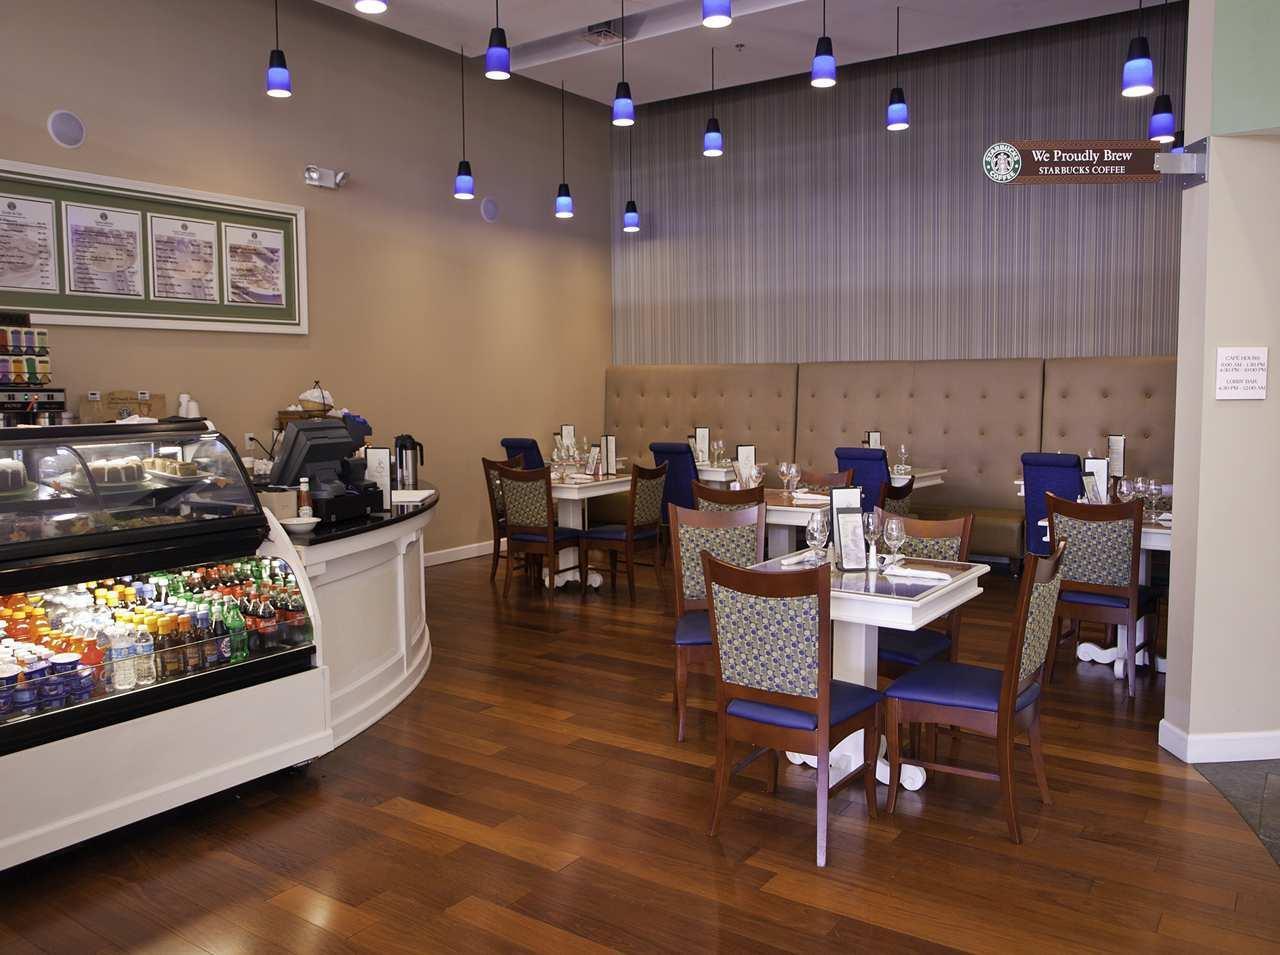 DoubleTree by Hilton Hotel Buffalo - Amherst image 4